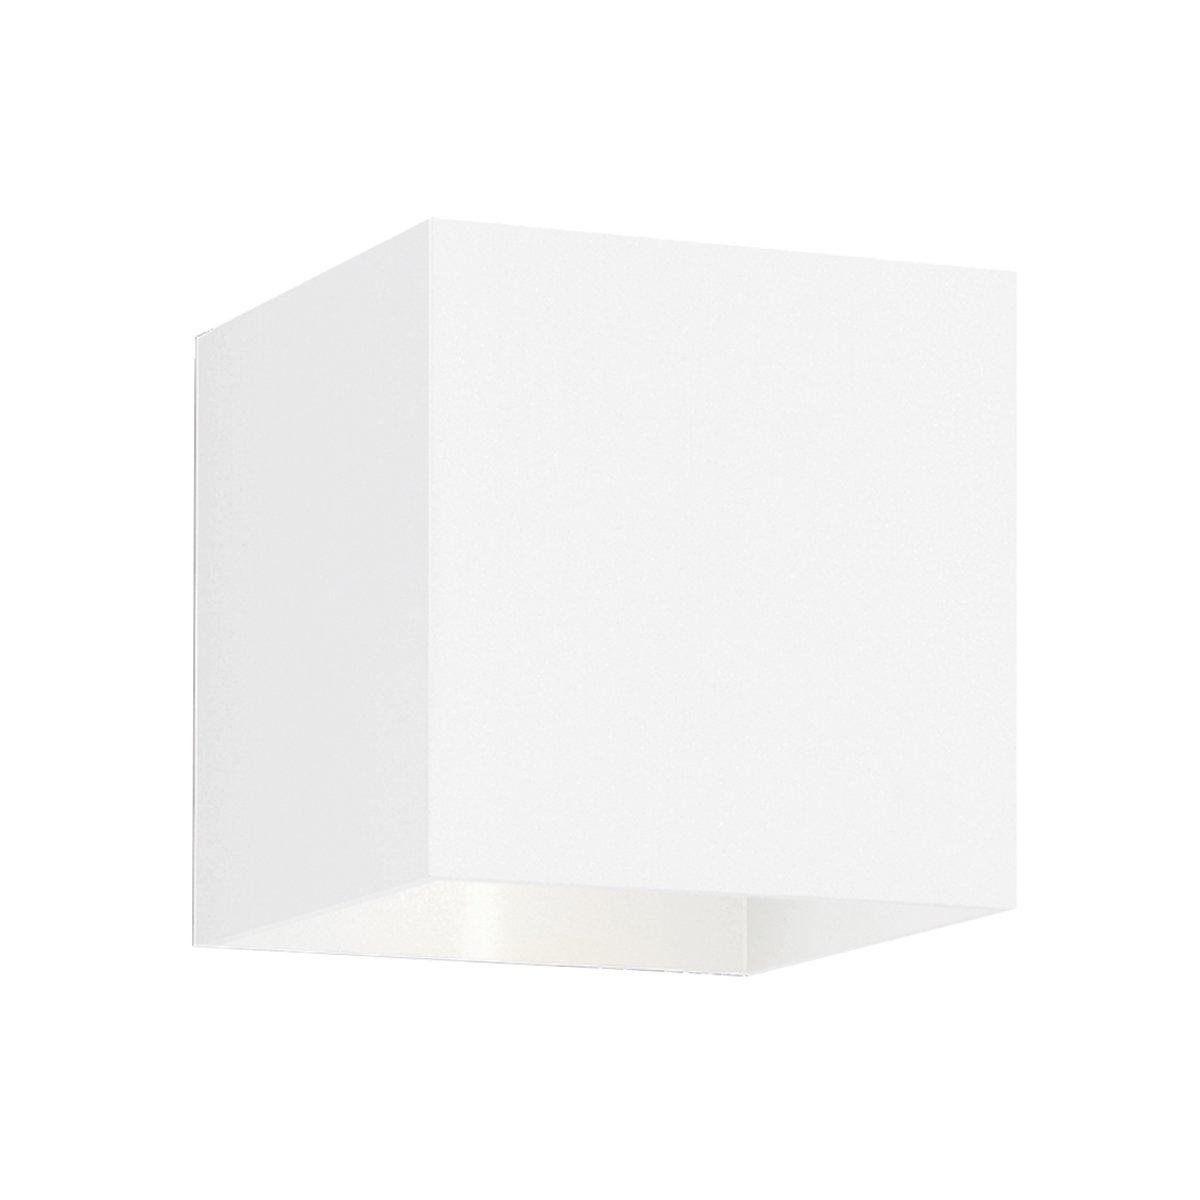 Wever & Ducr� Box 1.0 Outdoor Wandlamp Wit - 3000 Kelvin